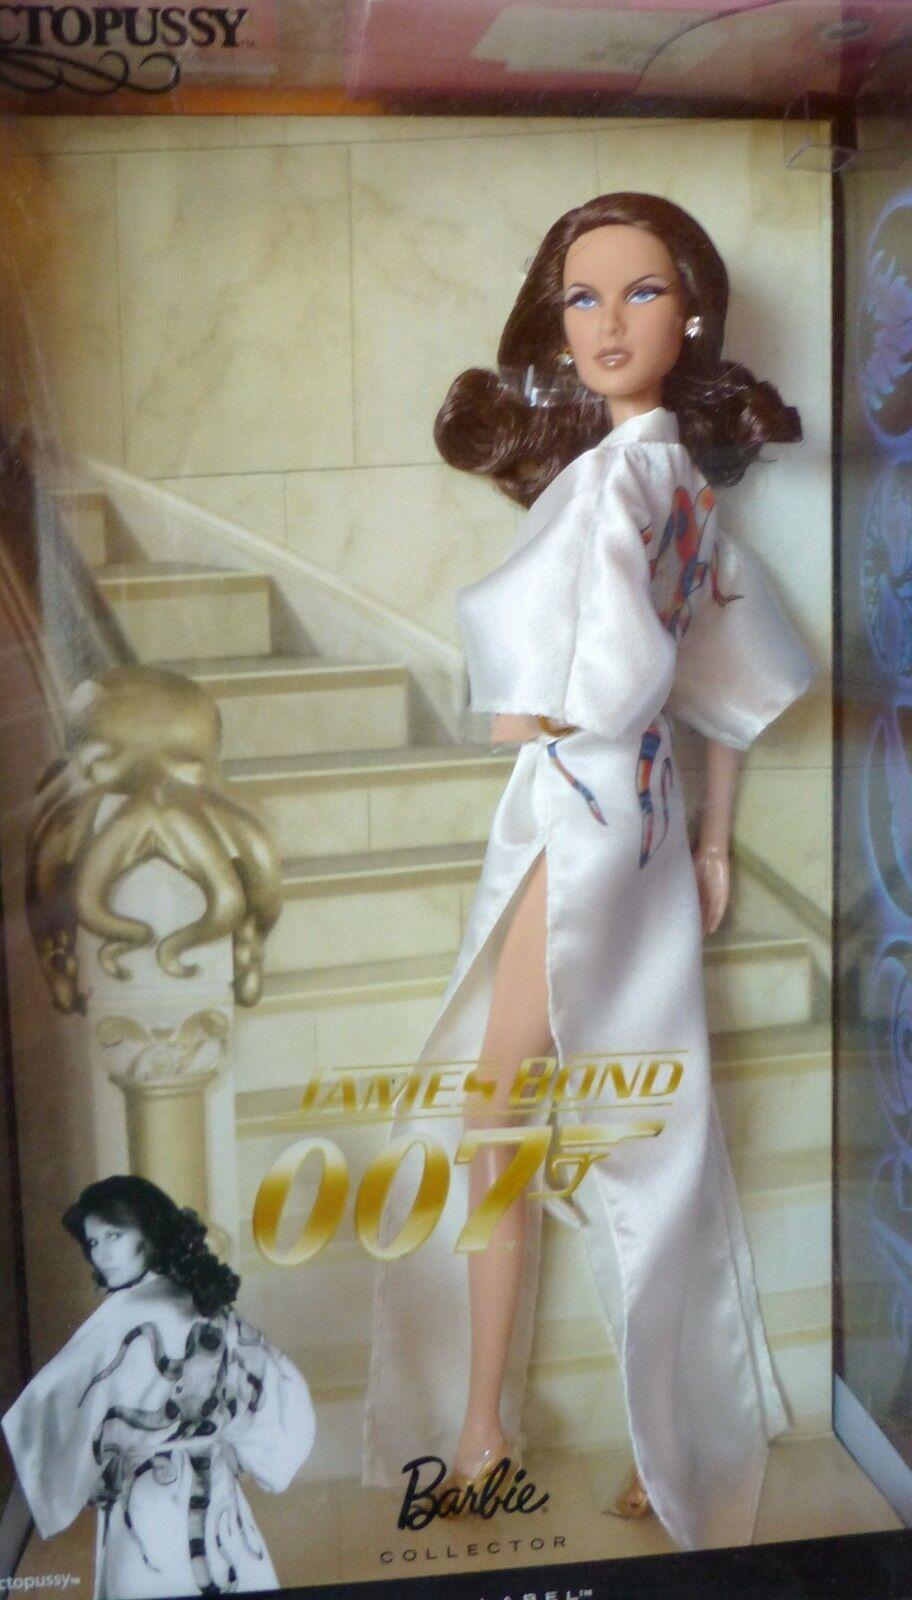 JAMES BOND 007 OCTOPUSSY FILM BARBIE loves Pop Kultur 2010  T4550 NRFB